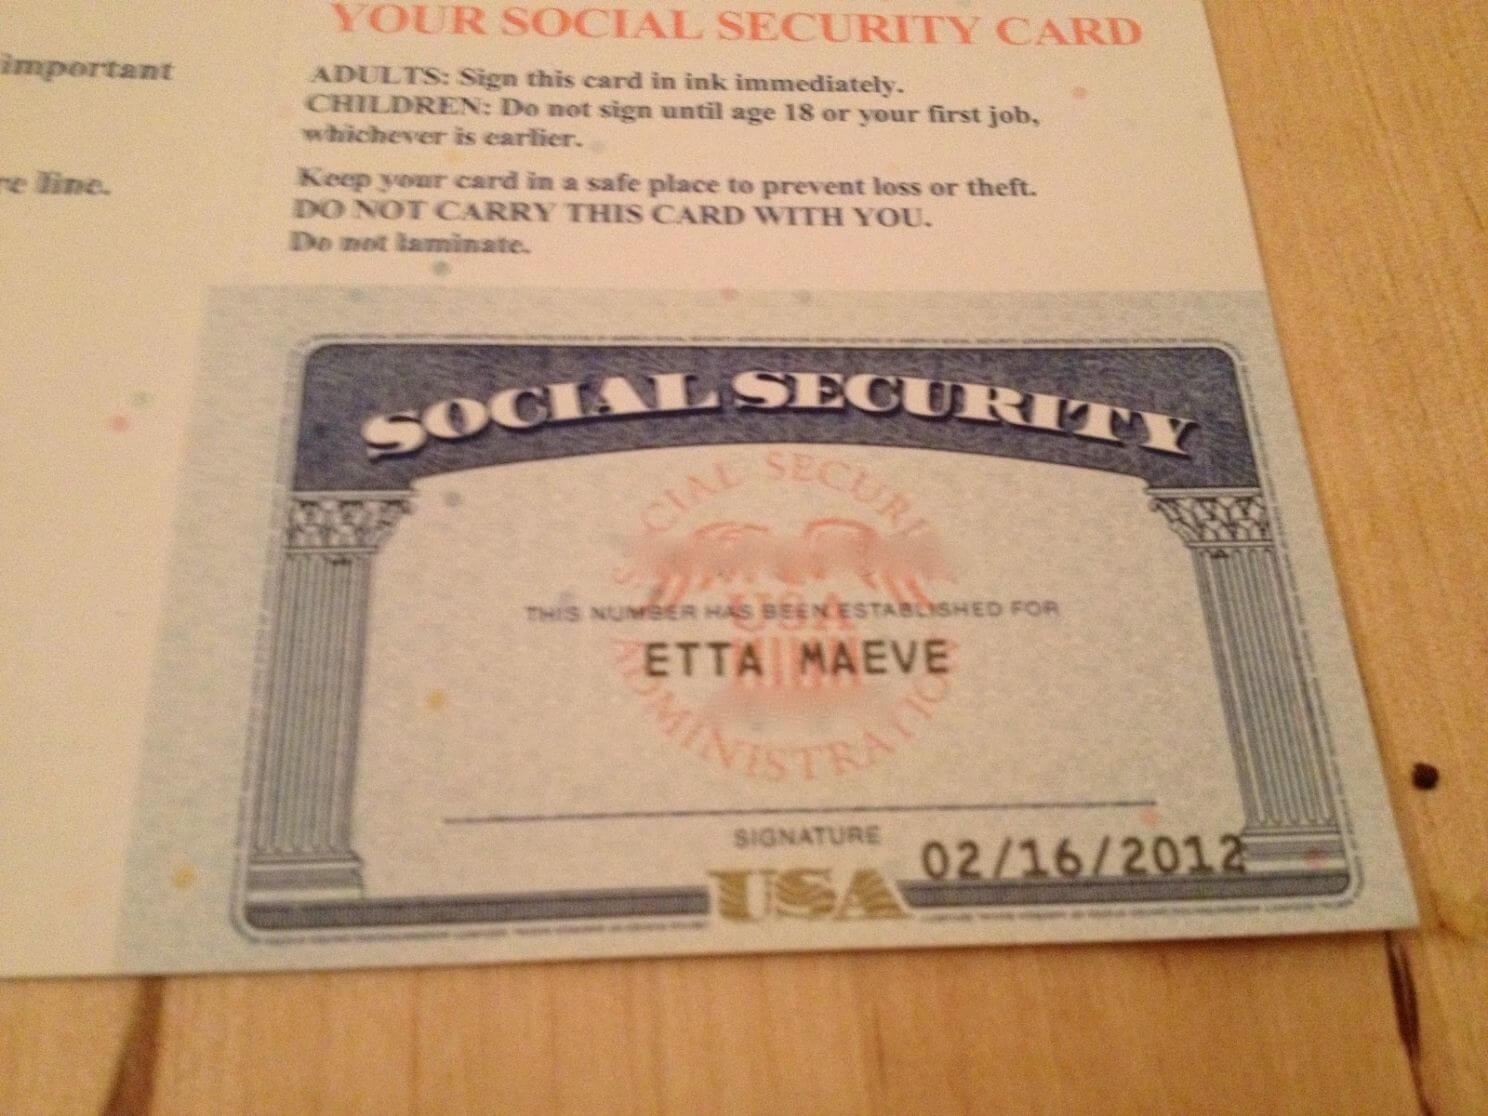 Social Security Card Template | Trafficfunnlr within Fake Social Security Card Template Download